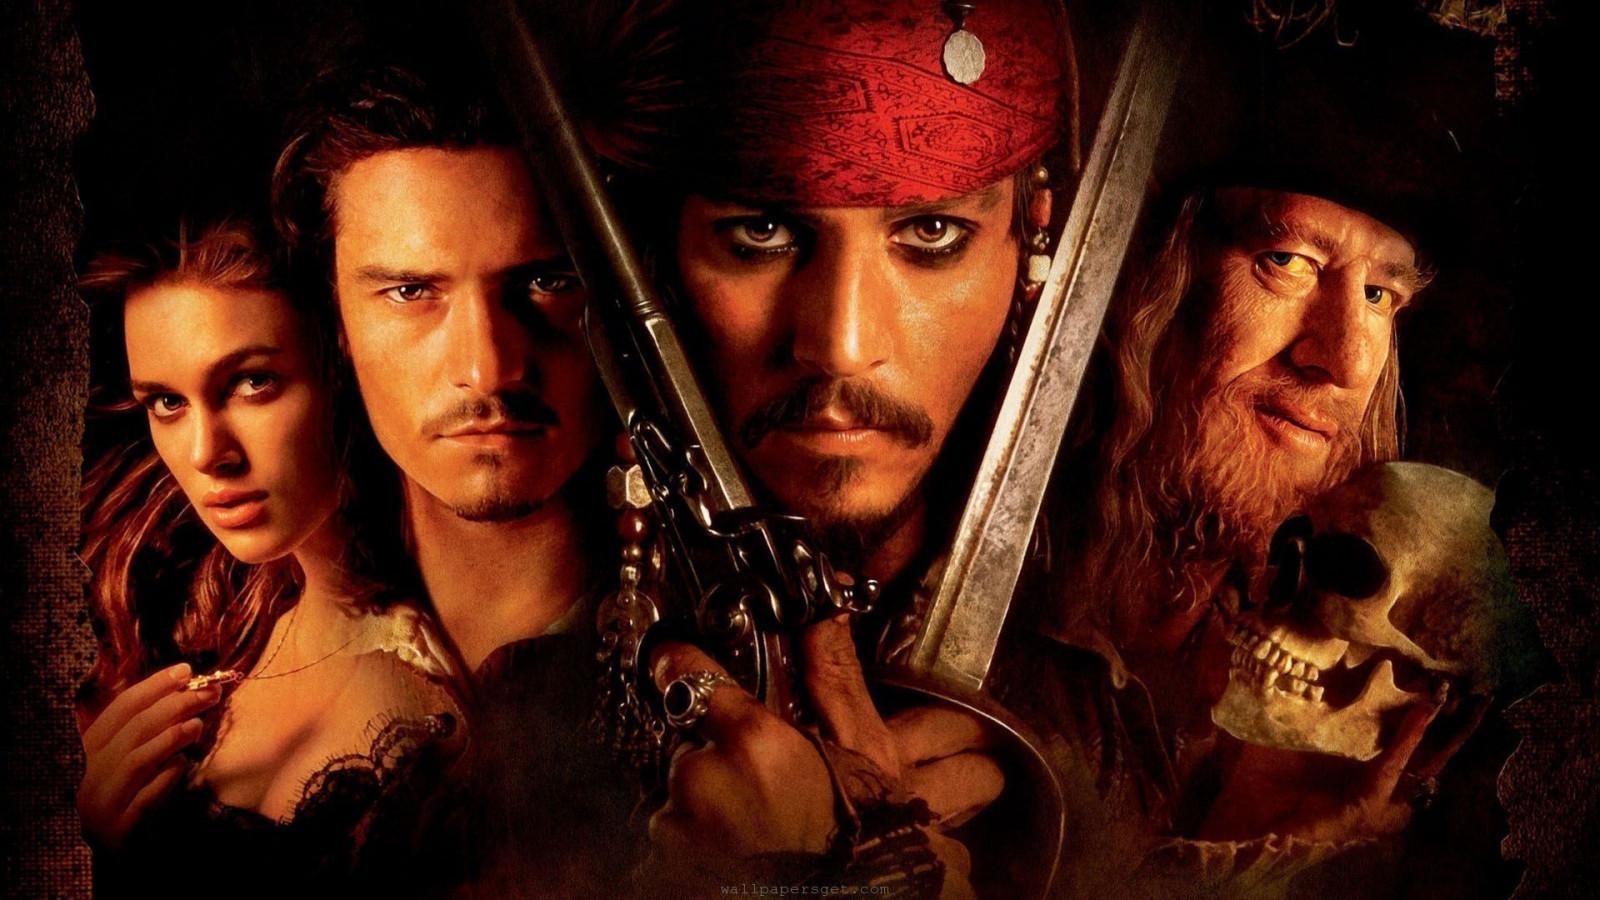 Papel De Parede Filmes Keira Knightley Johnny Depp Orlando